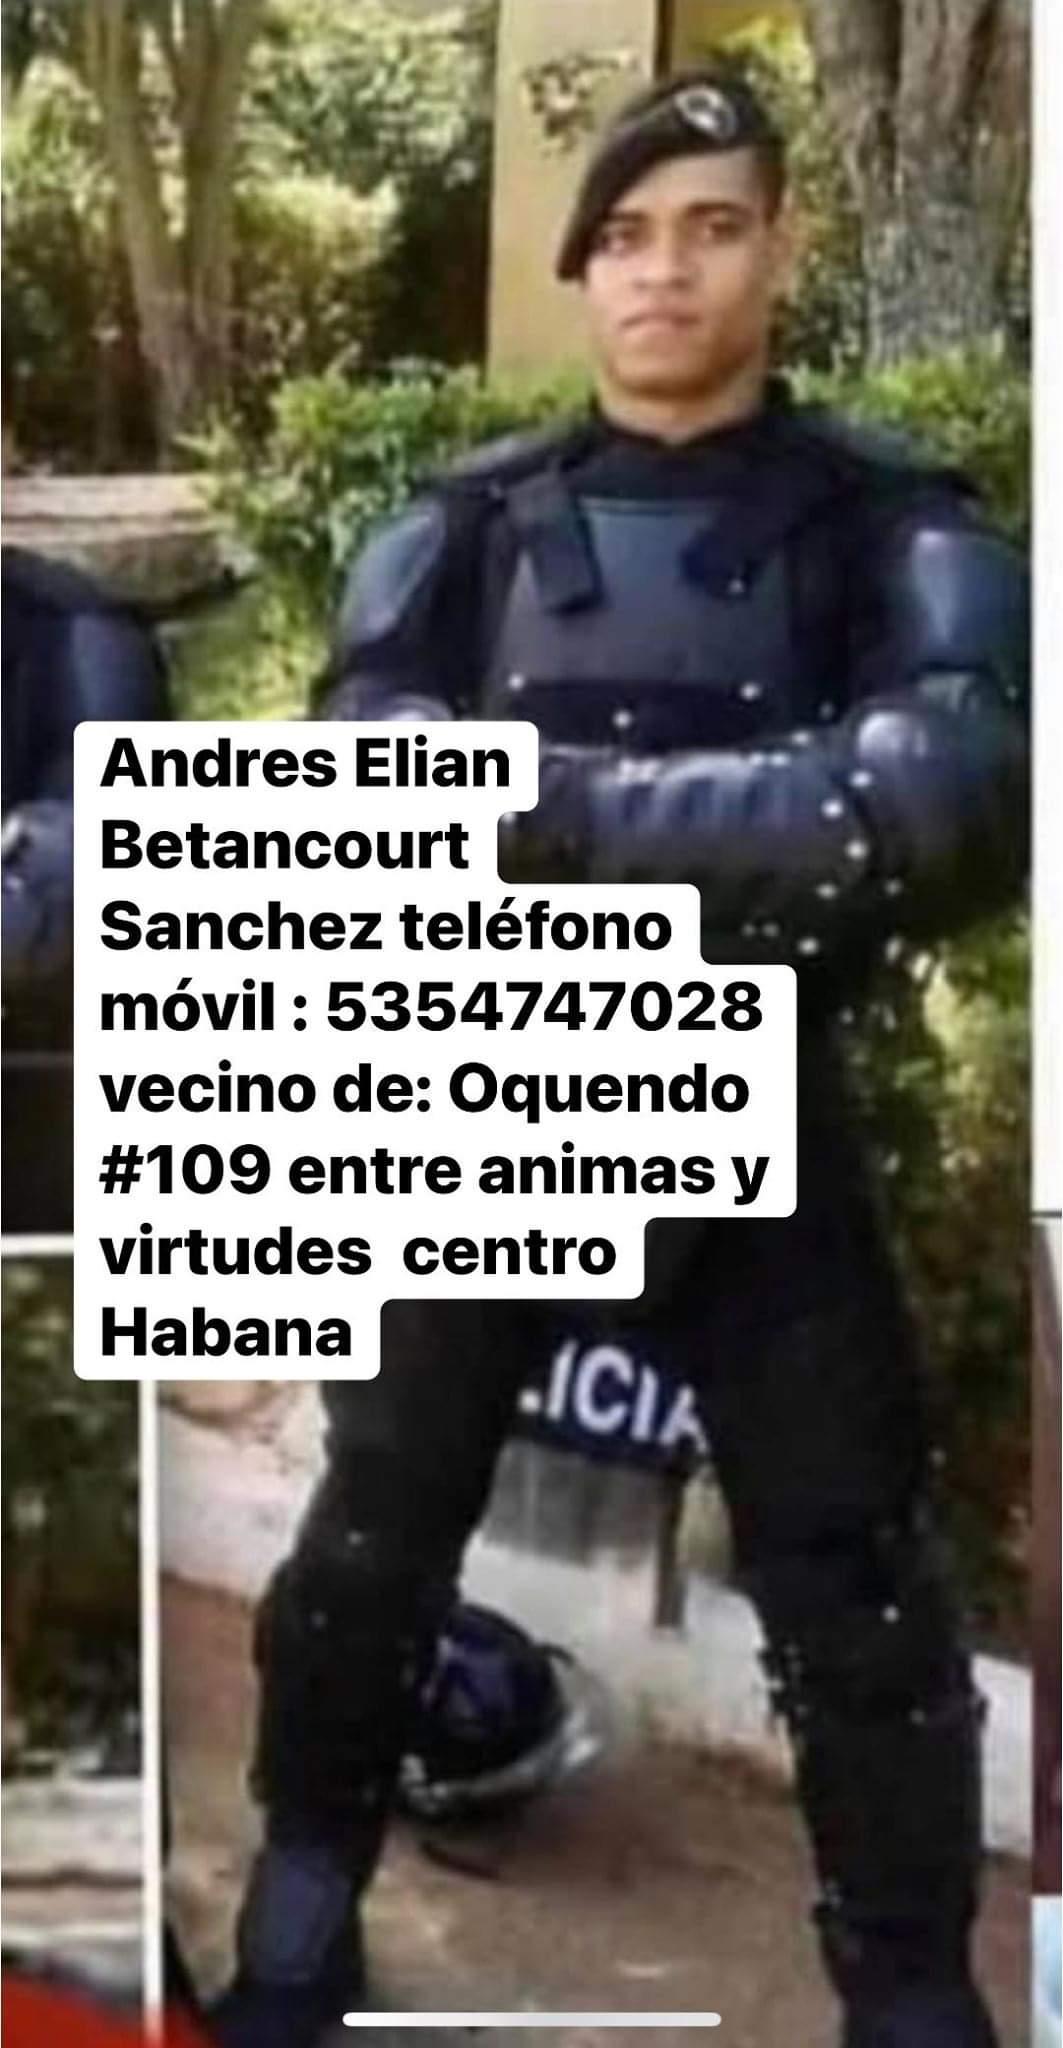 Andres Elian Betancourt (Alias El Pudin )